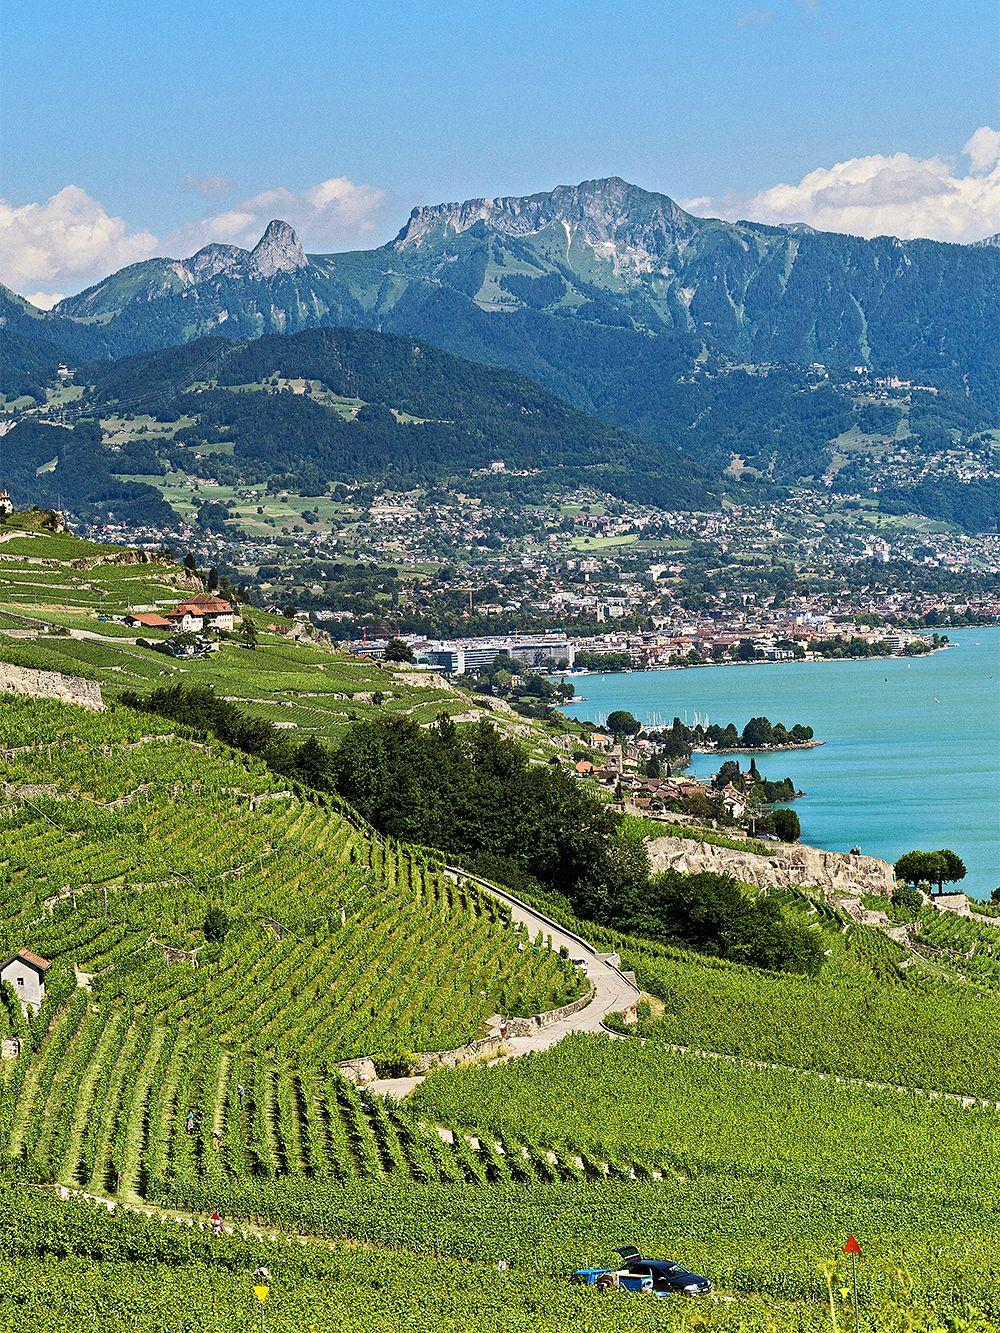 Biking trips in spectacular places: Lake Geneva, Switzerland and France